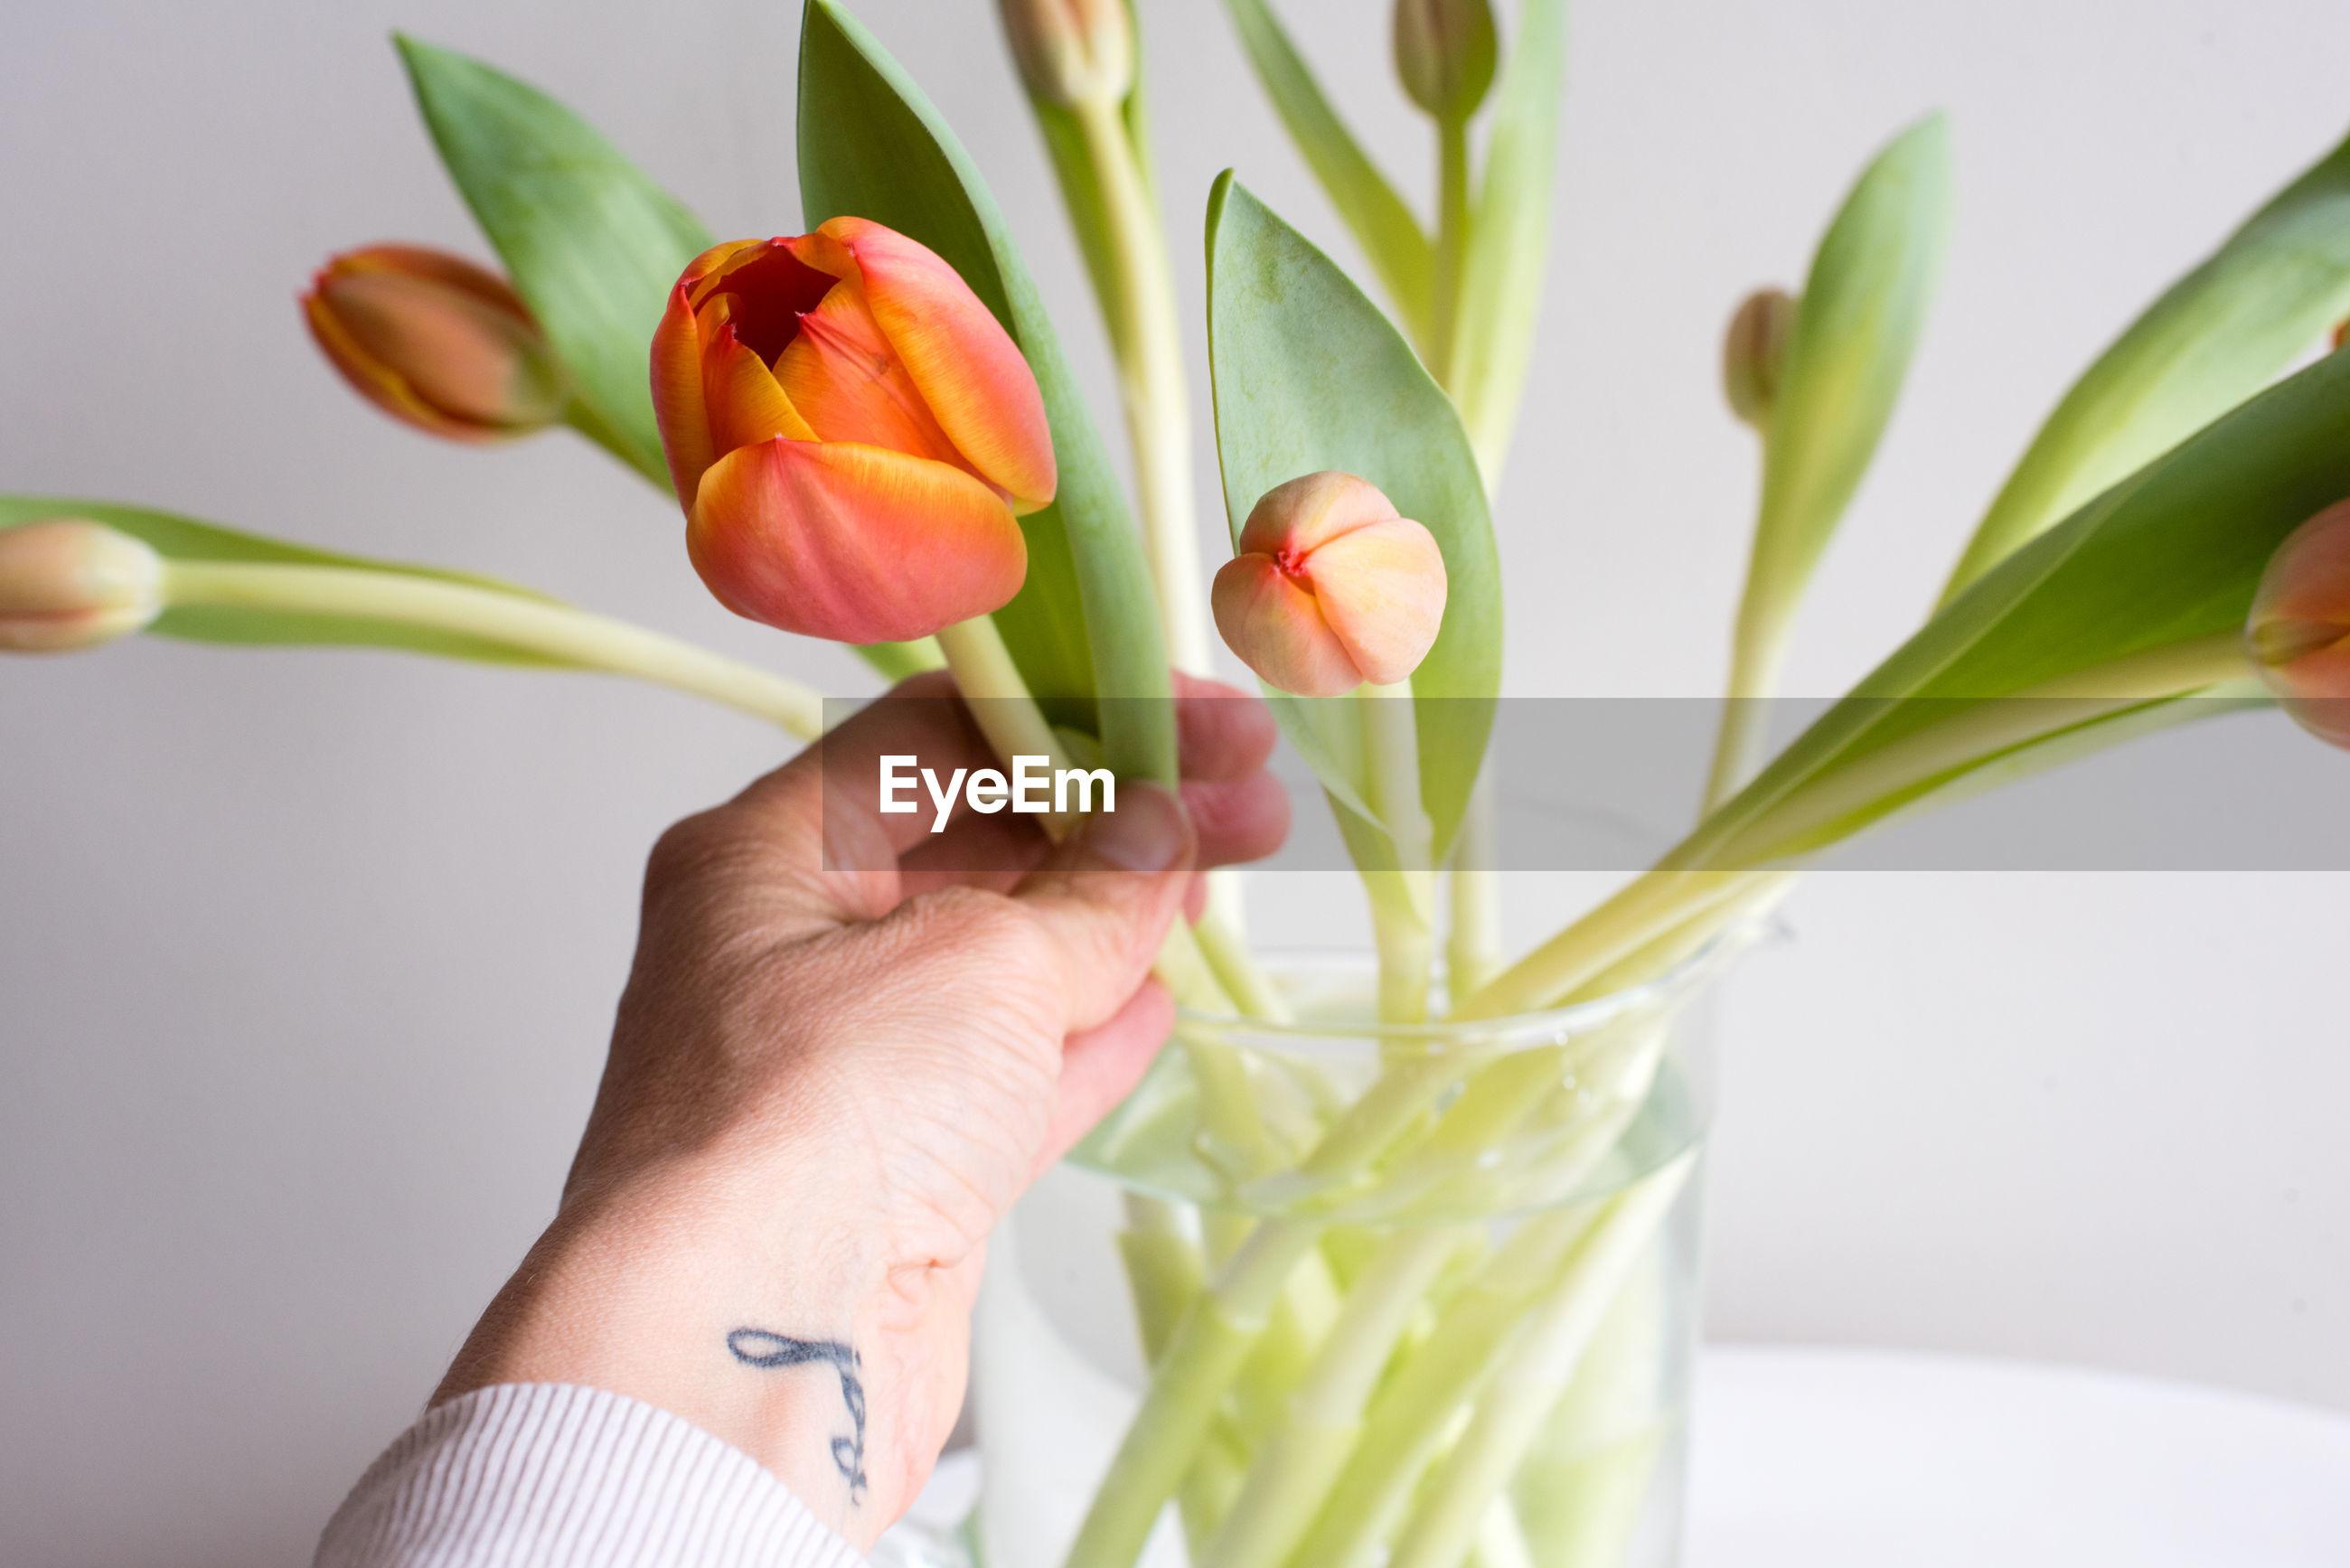 Cropped image of hand holding orange tulip in vase against white background